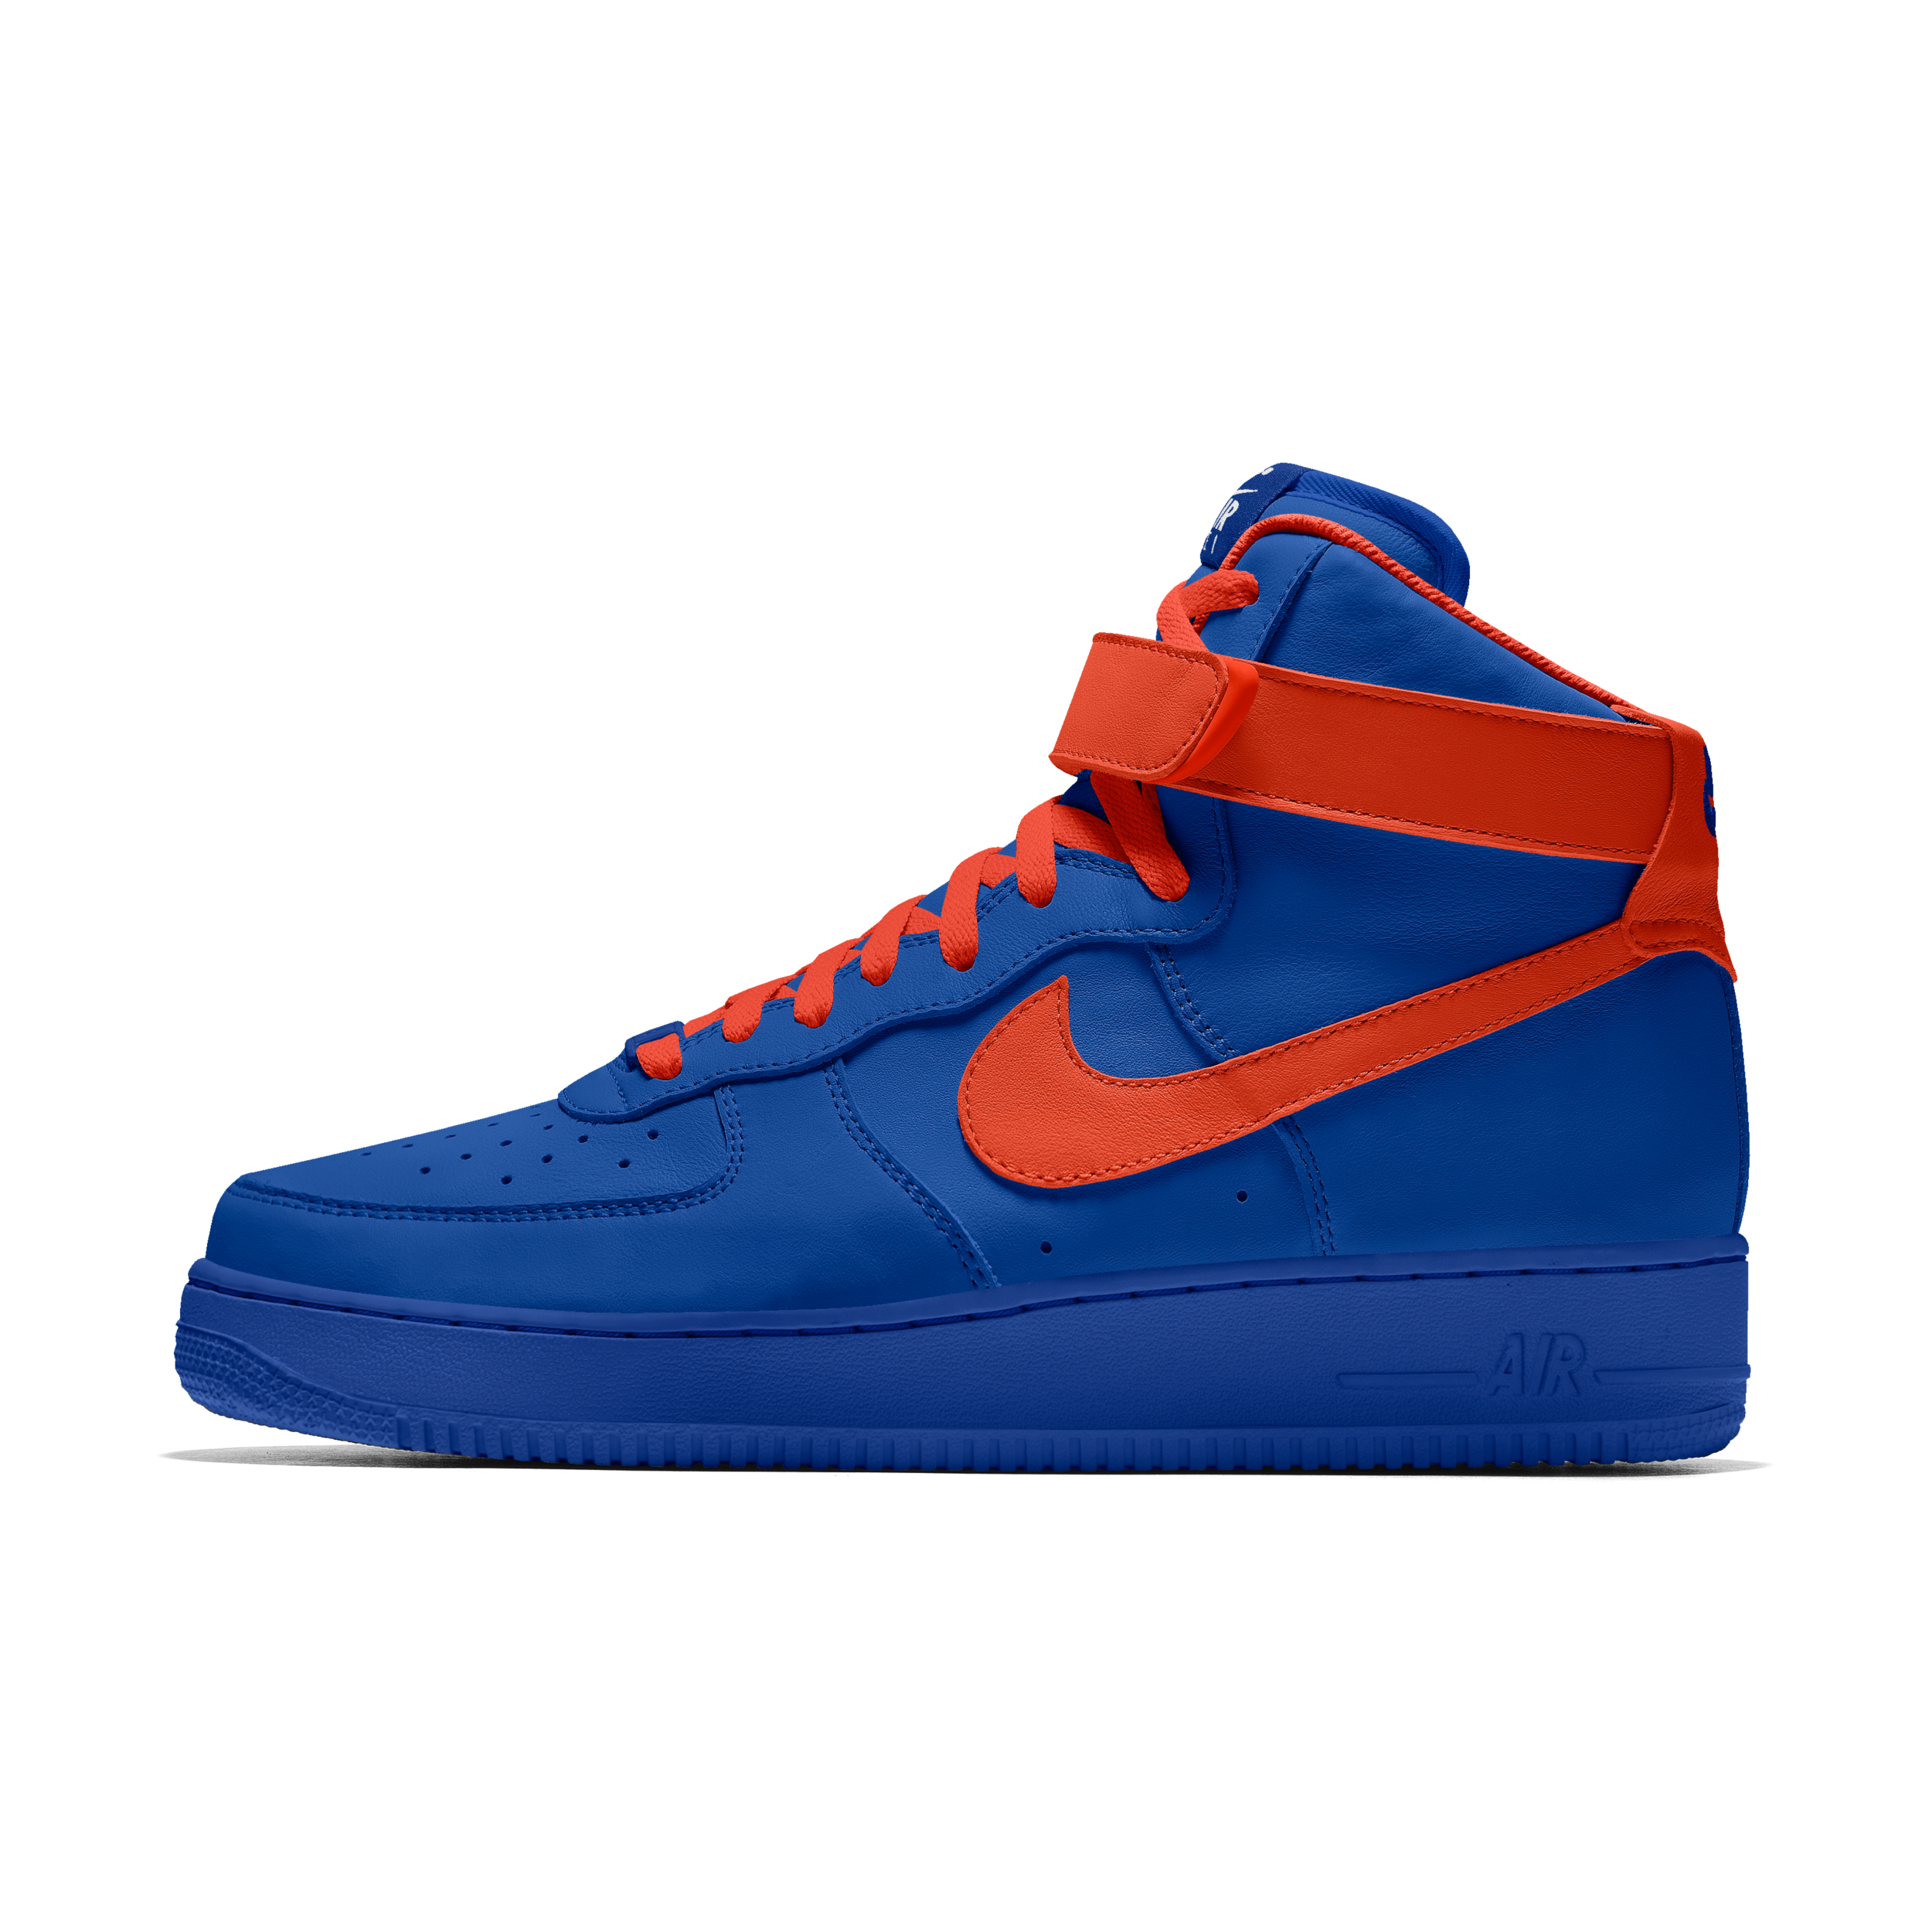 Nike Air Force 1 High iD Schuh. DE   sneakerhead in